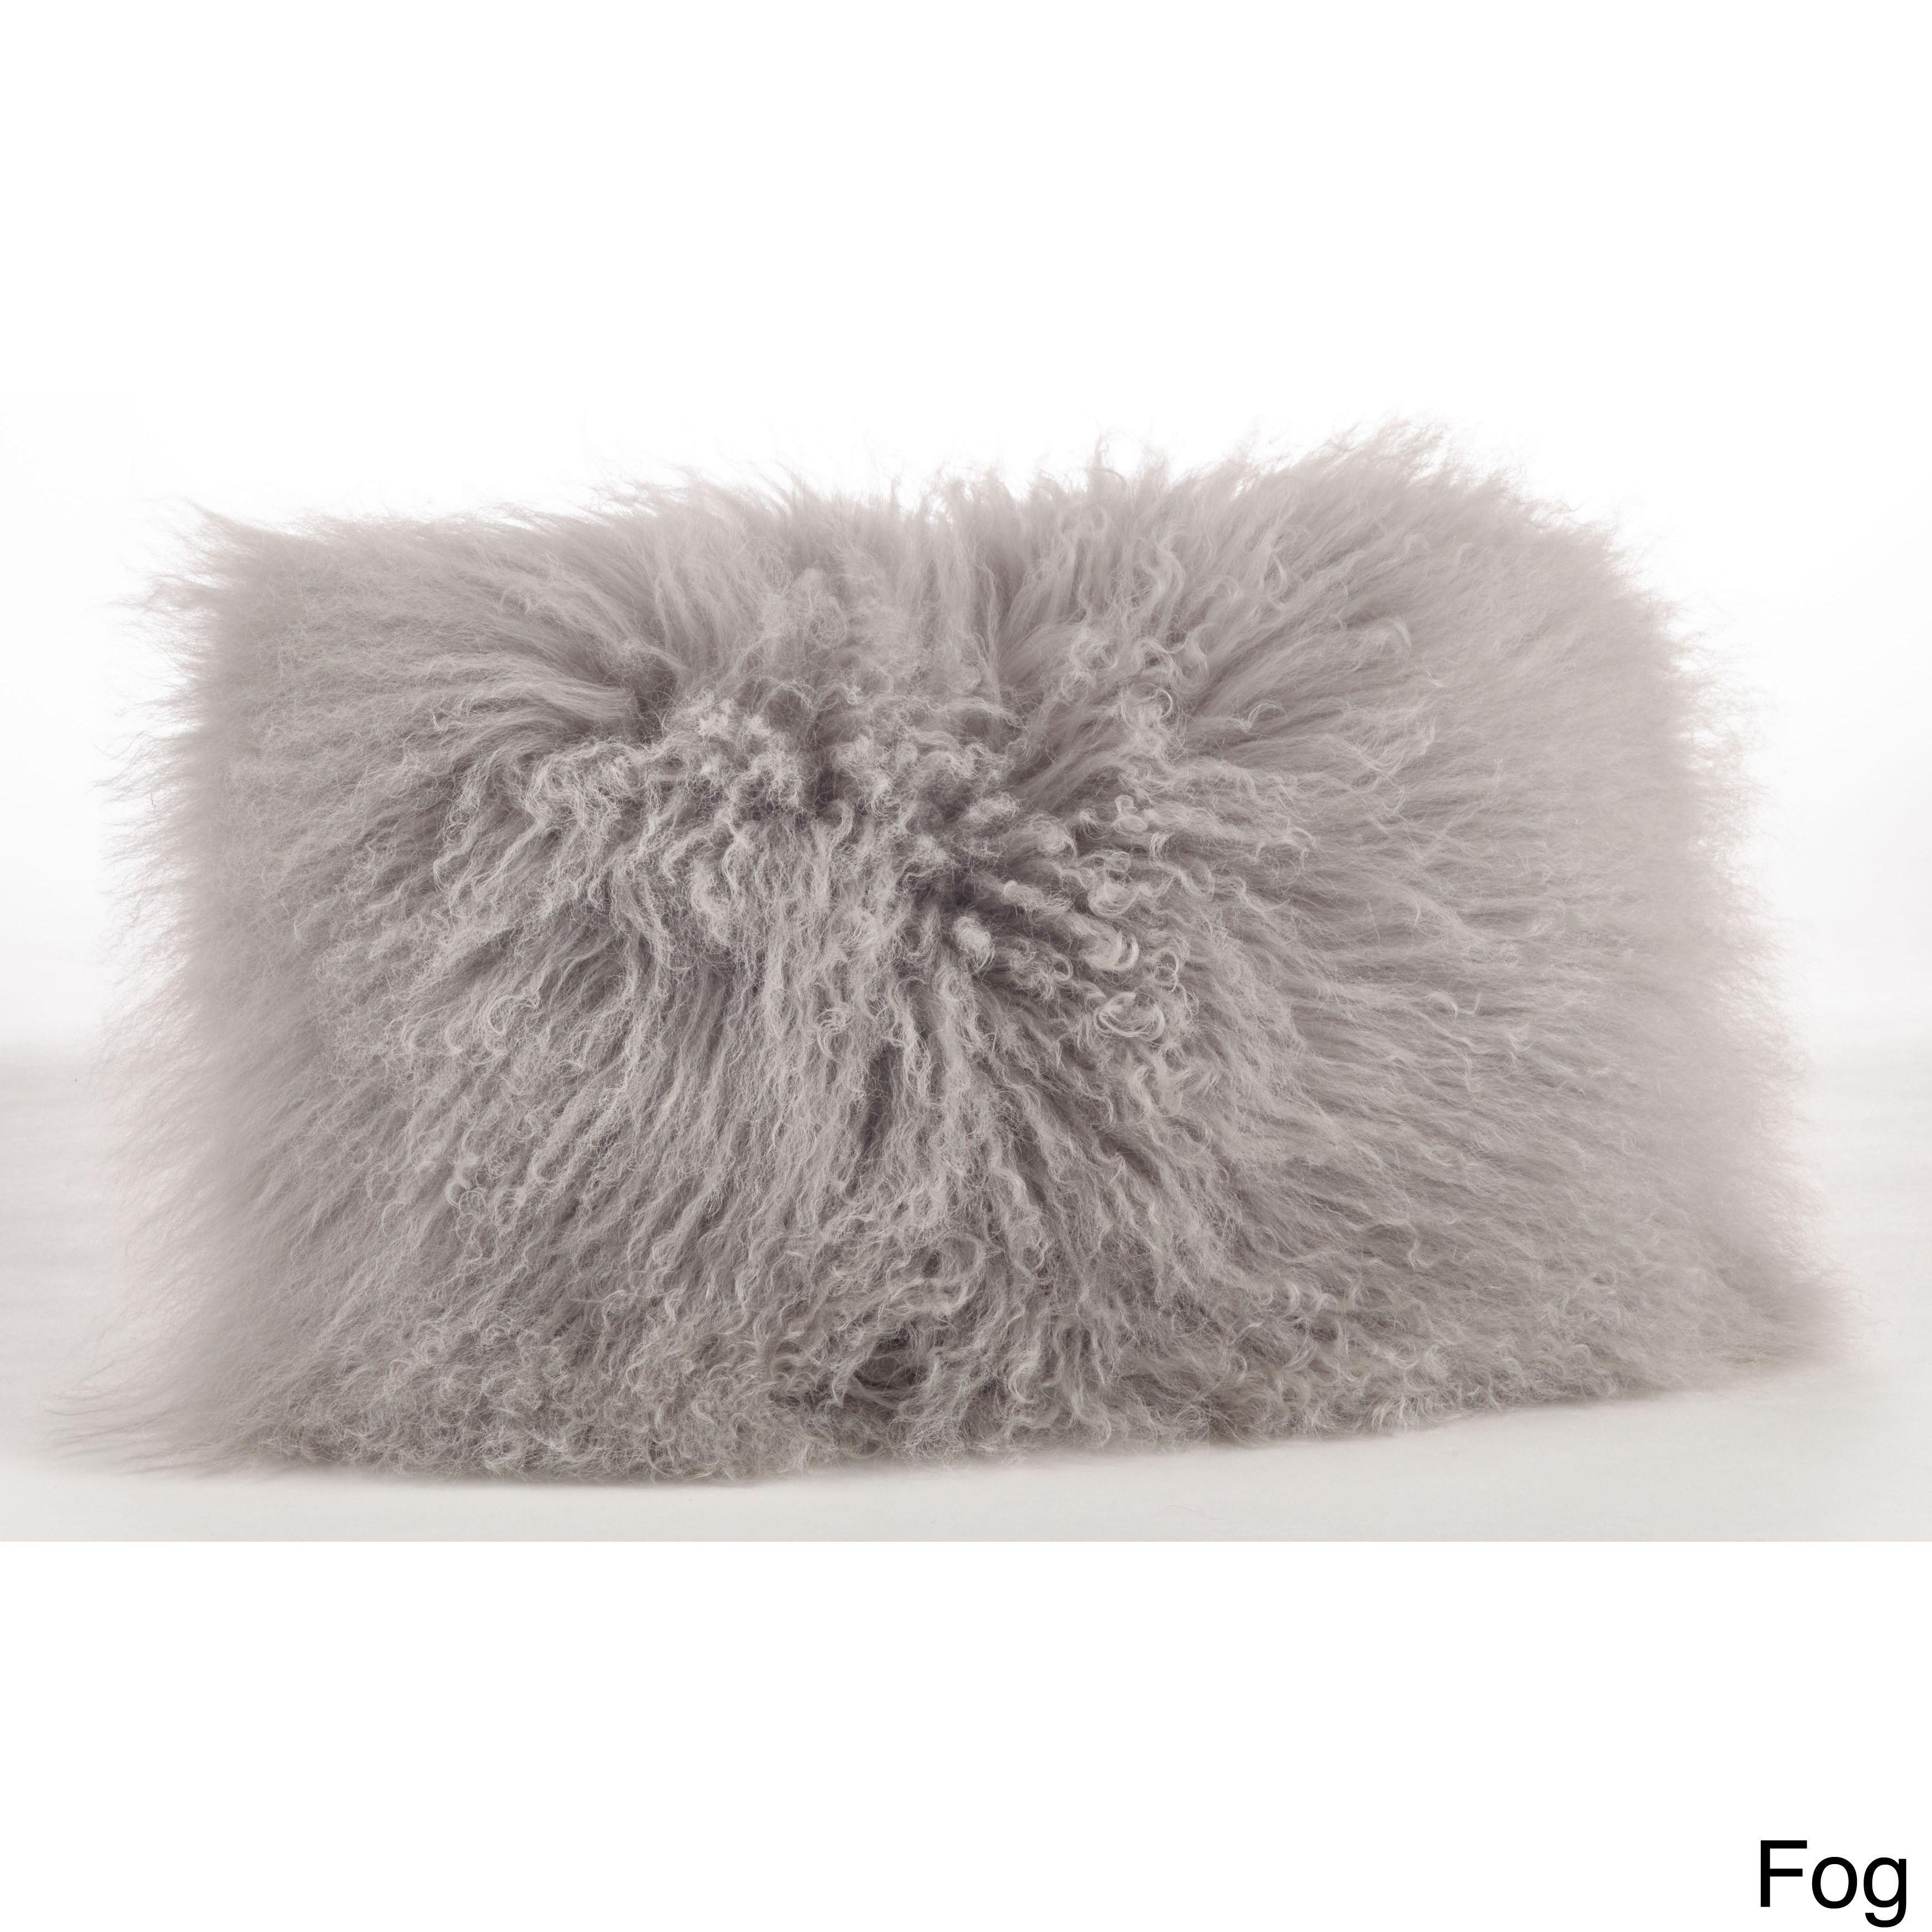 pillow by lamb best encouraging sheri com images aquasealpro collections covers faux bundle of designer x shag fur